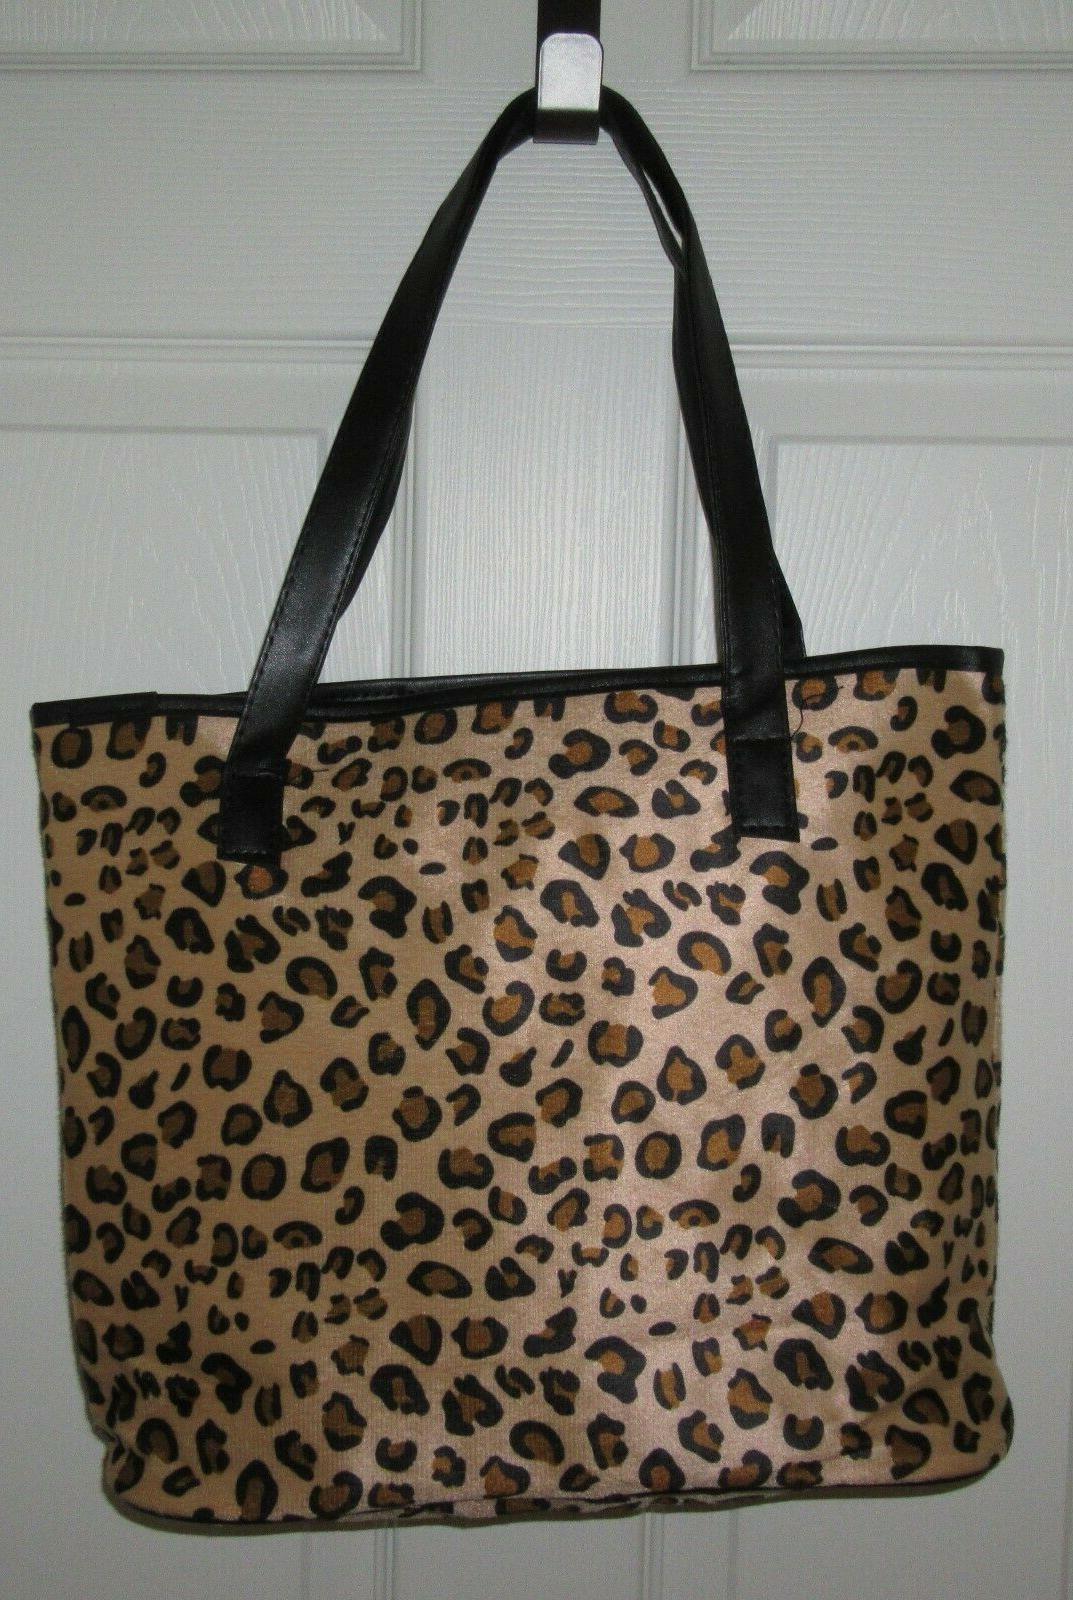 NEW Cheetah Animal Print Tote Purse